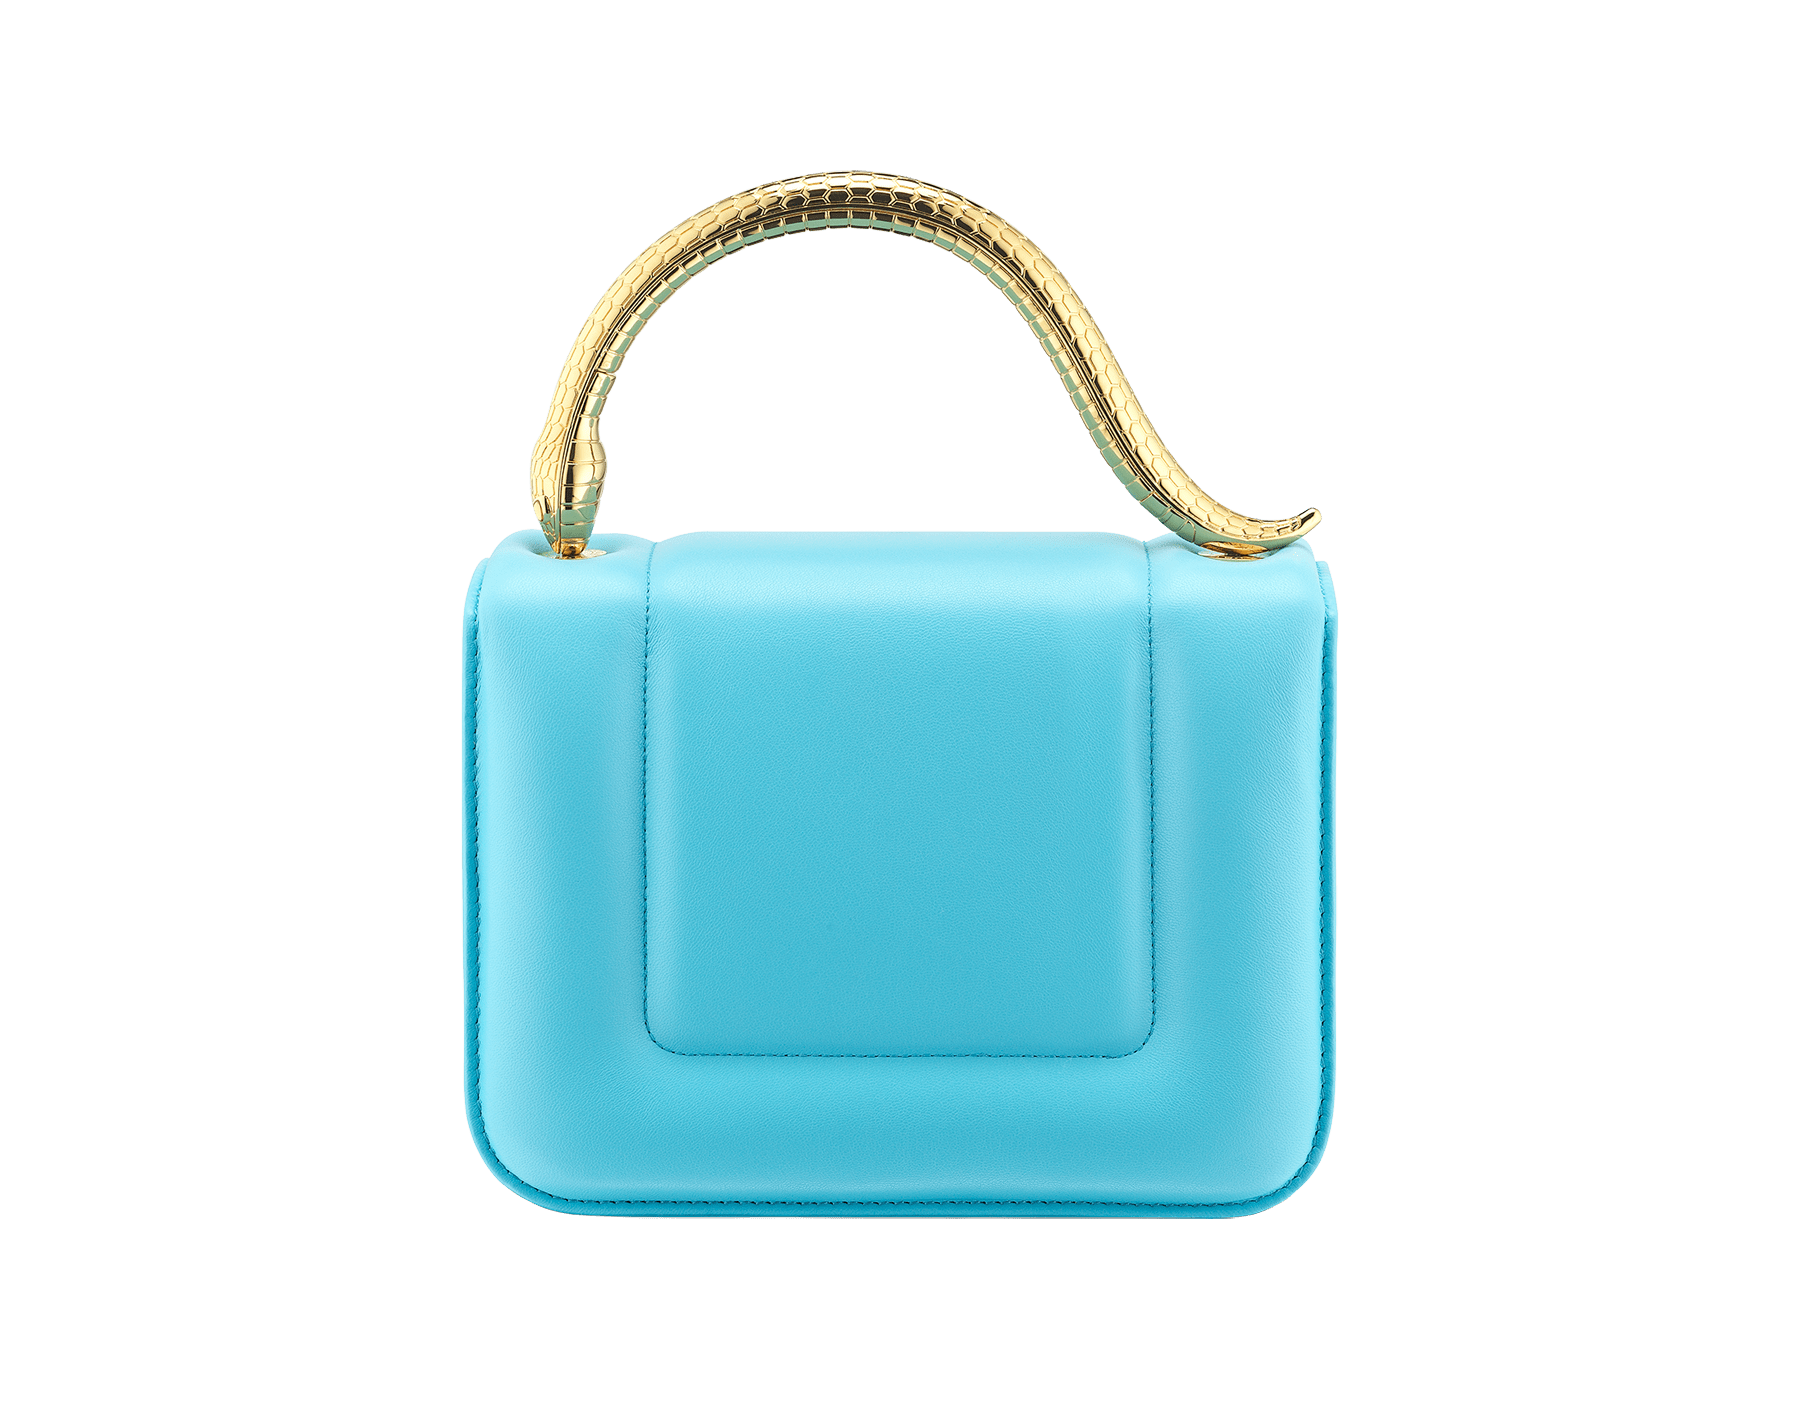 Mary Katrantzou x Bvlgari 手提包,採用柔軟的 Aegean Toapz 藍色絎縫納帕軟面皮,Aegean Toapz 藍色納帕軟面皮襯裡。新式金色黃銅 Serpenti 蛇頭扣環,誘人蛇眼鑲飾水晶。特別版包款。 MK-1142 image 3